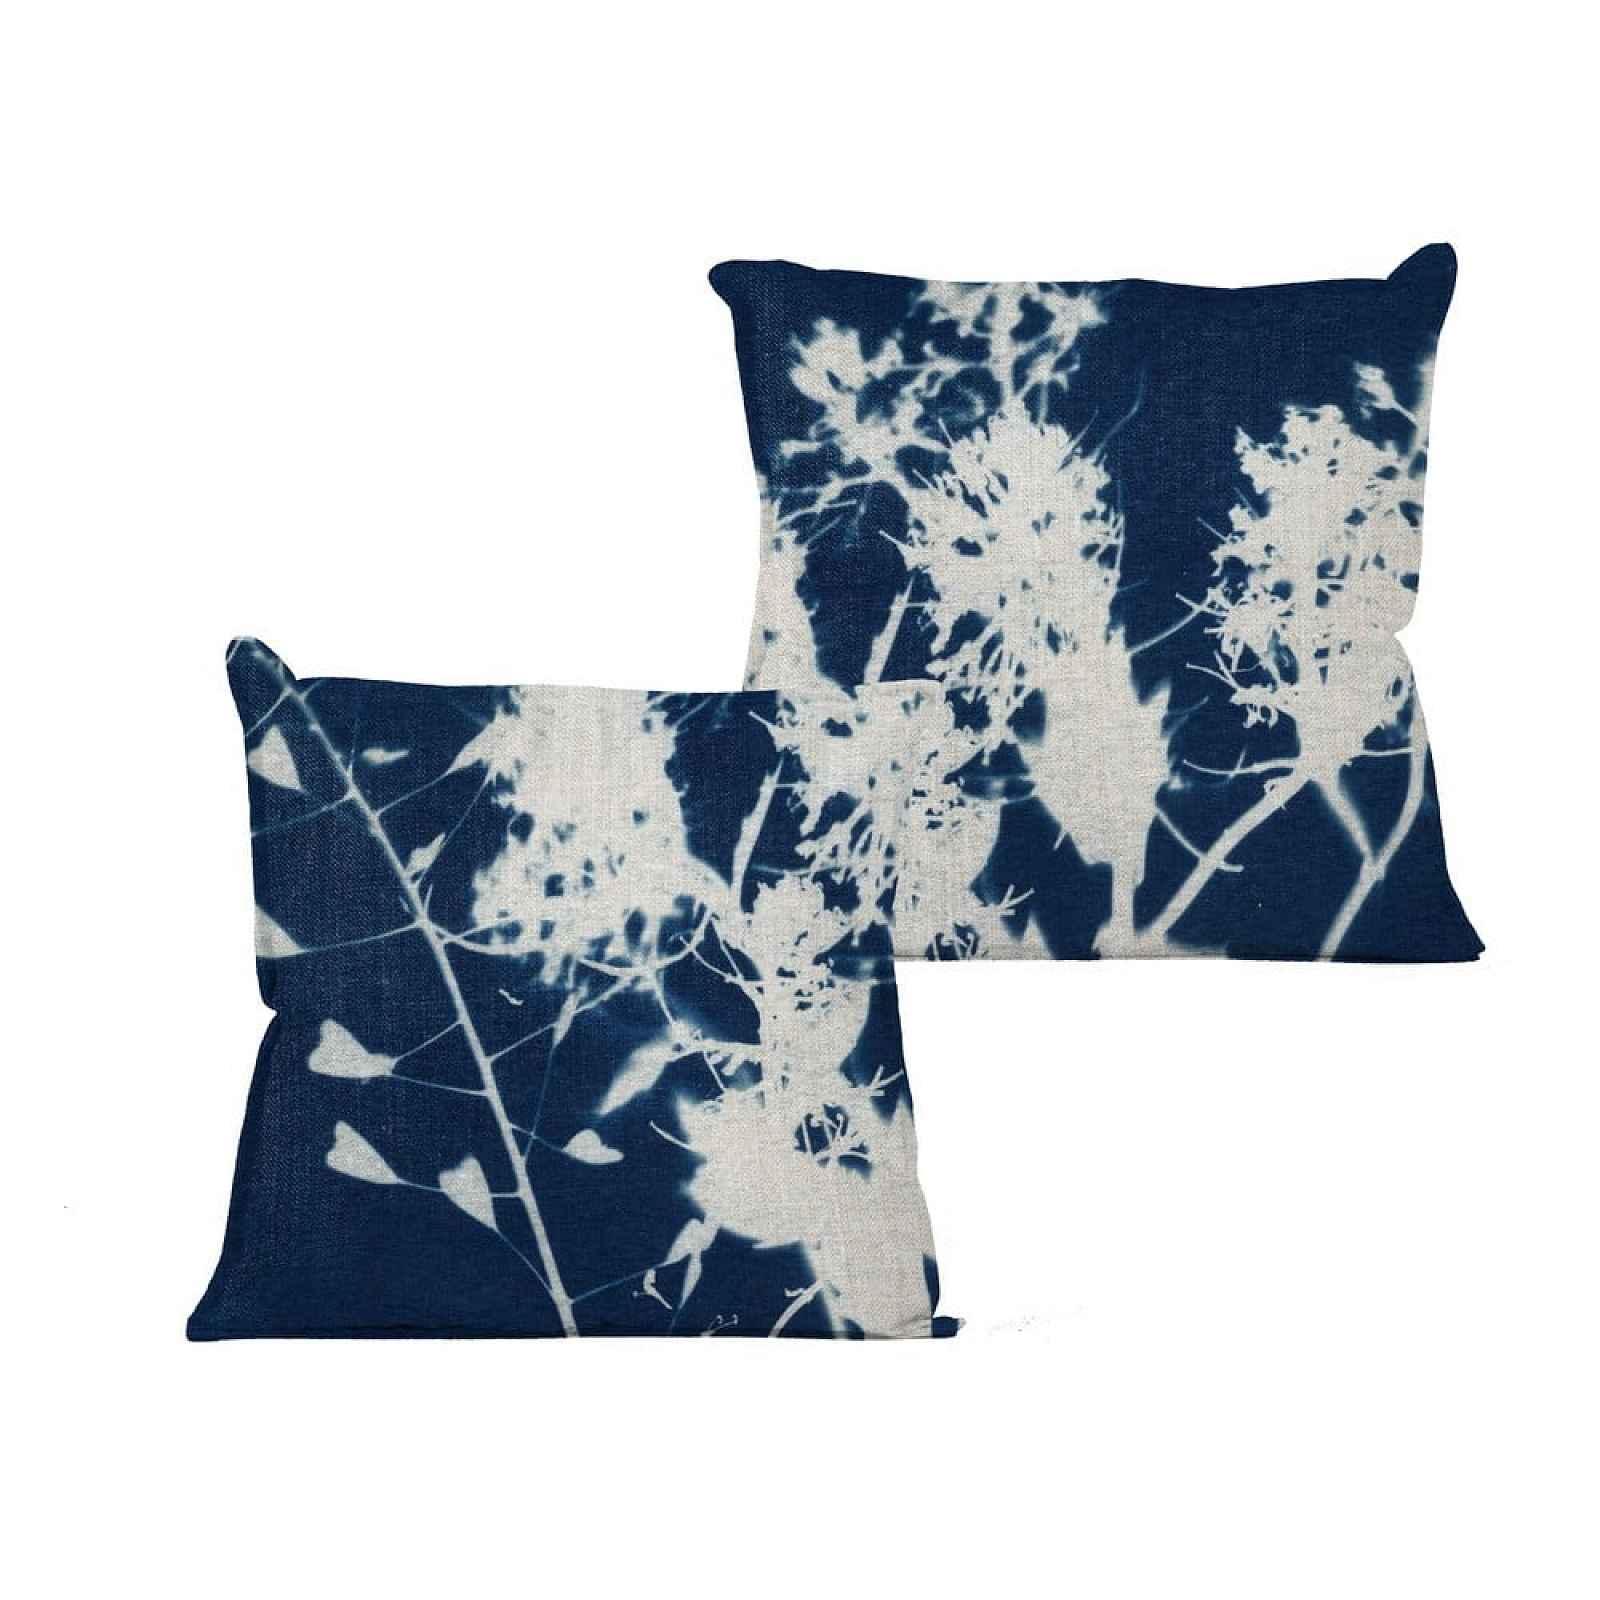 Modrý polštář s abstraktním vzorem Linen Couture Spot,45x45cm